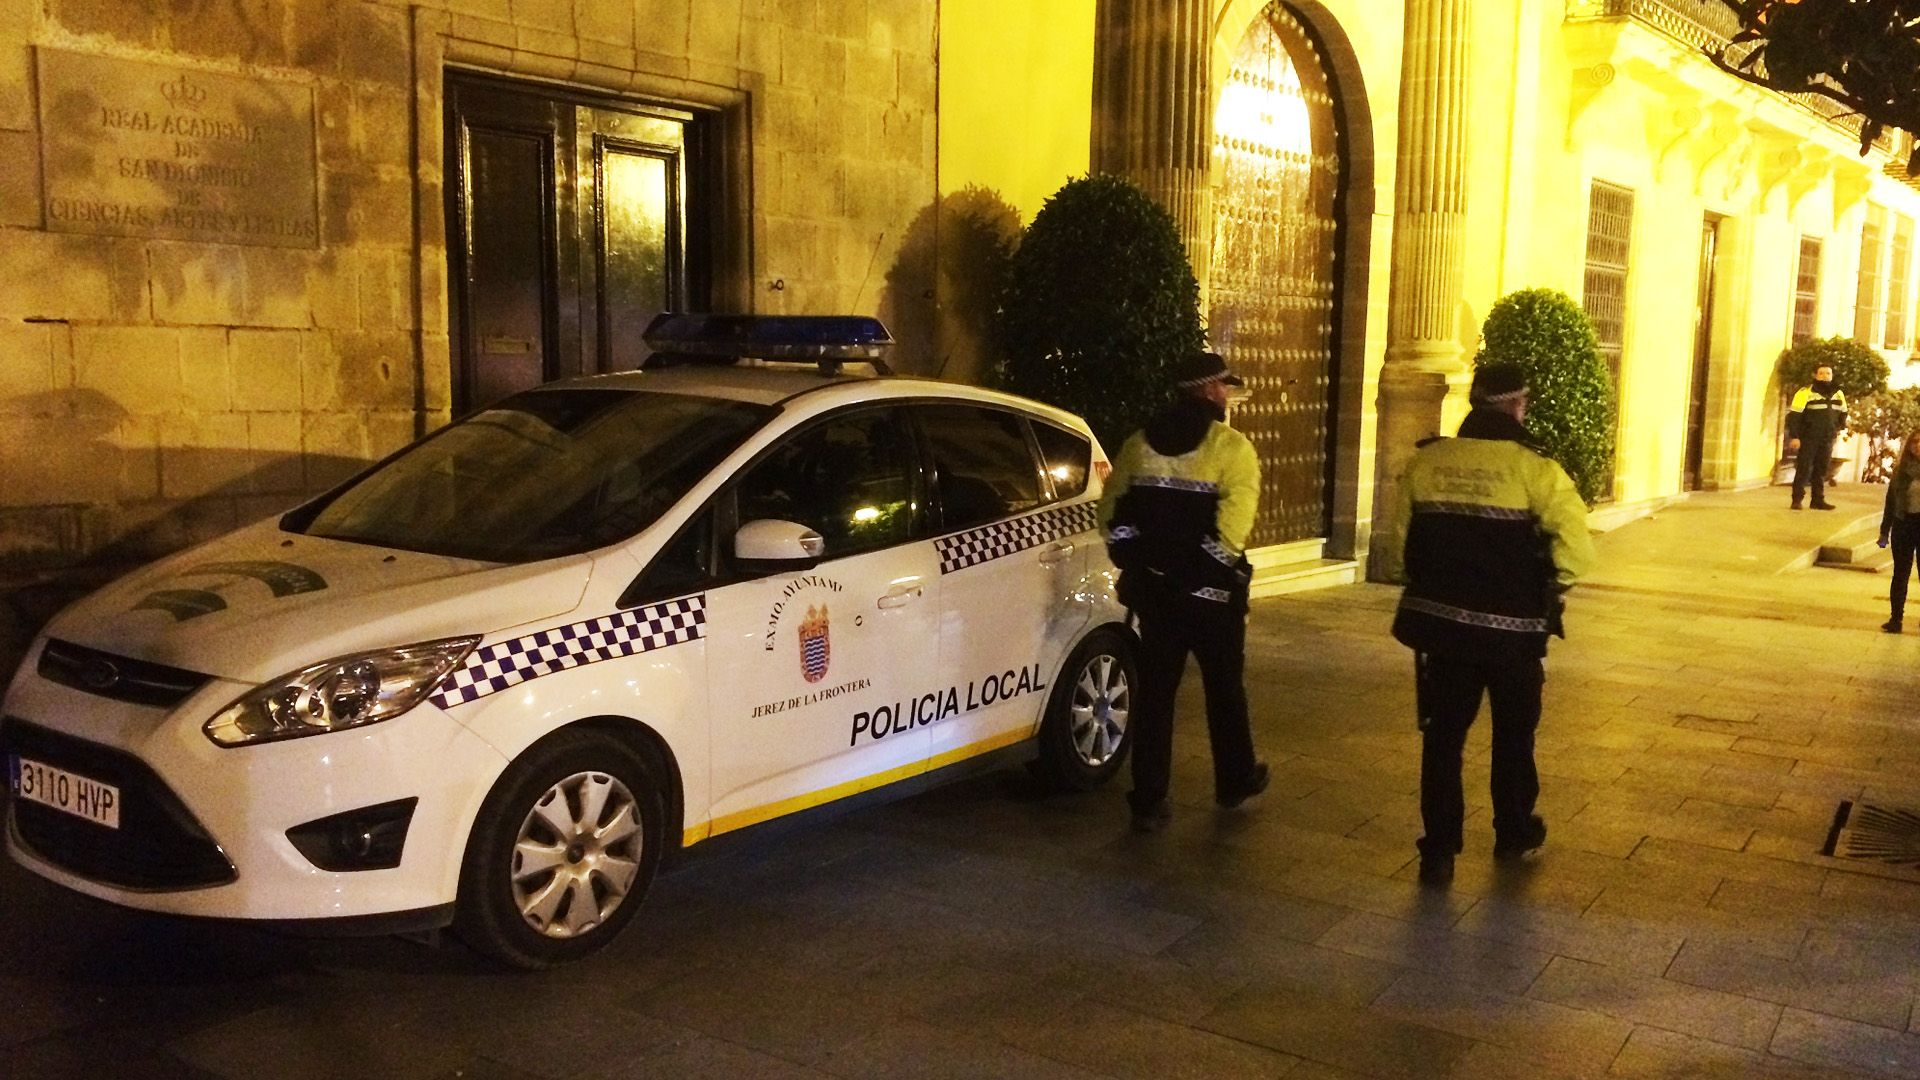 coche policia local ayuntamiento Jerez